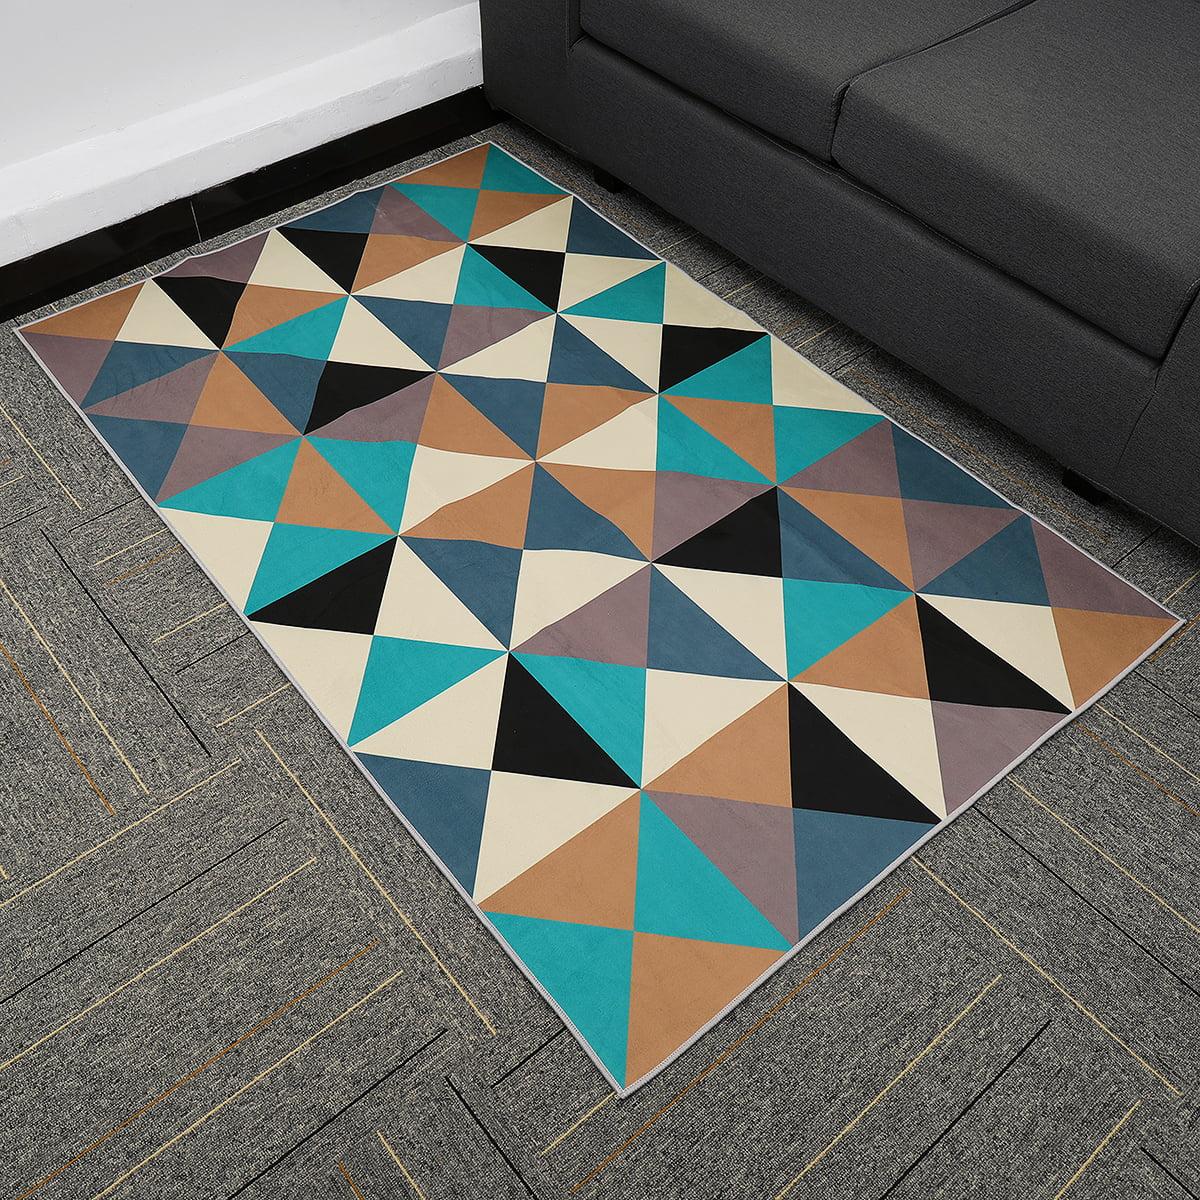 Area Rugs Floor Mat Bedroom Living Room Carpet Modern Printing Geometric Home Walmart Com Walmart Com